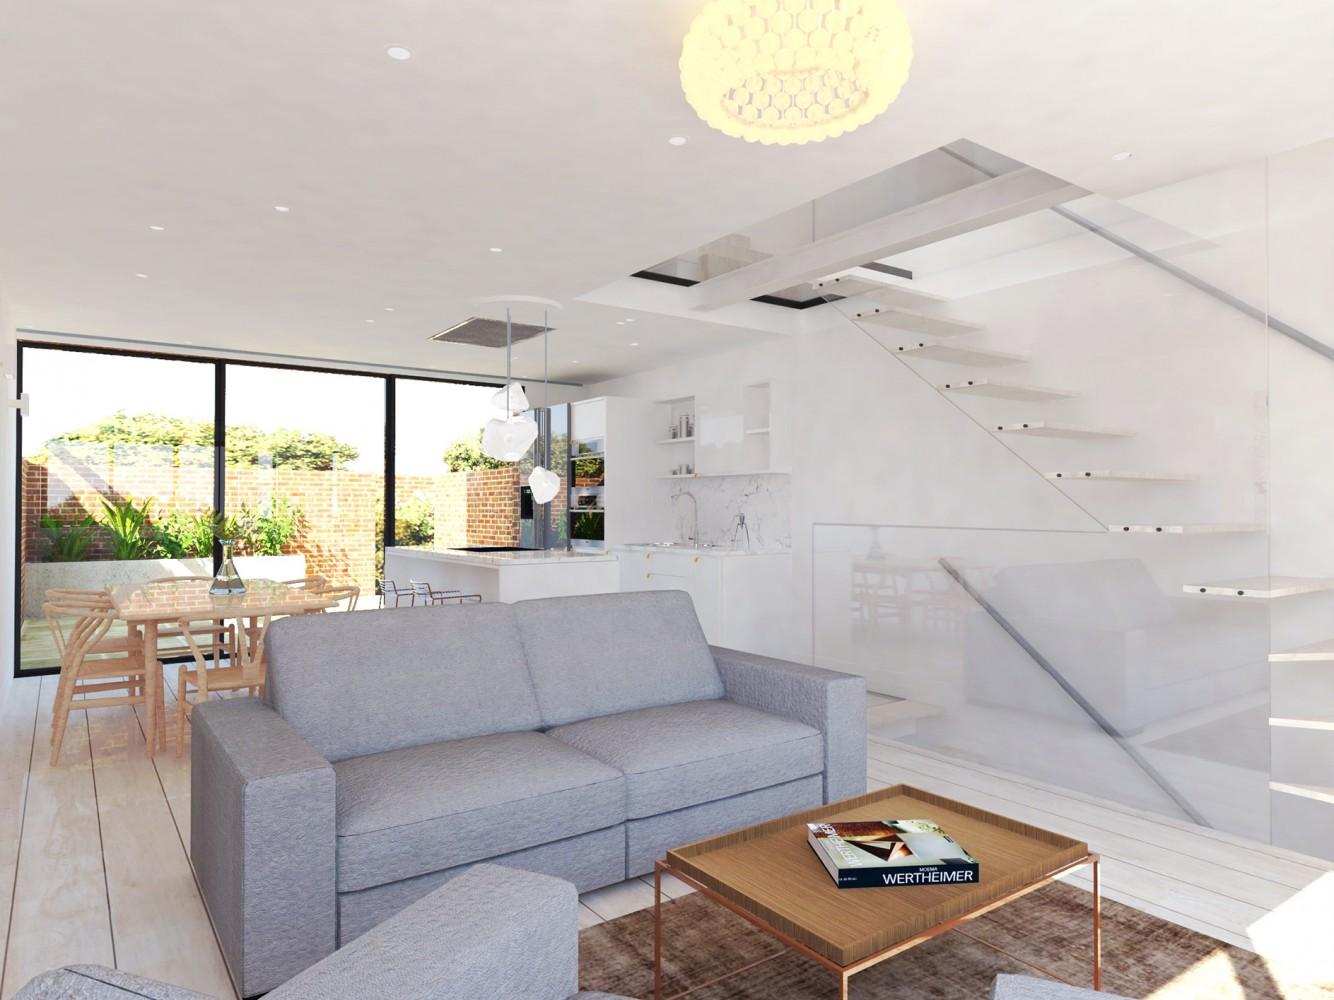 Peter Morris Architects - 58 Kensington Place - GROUND 1